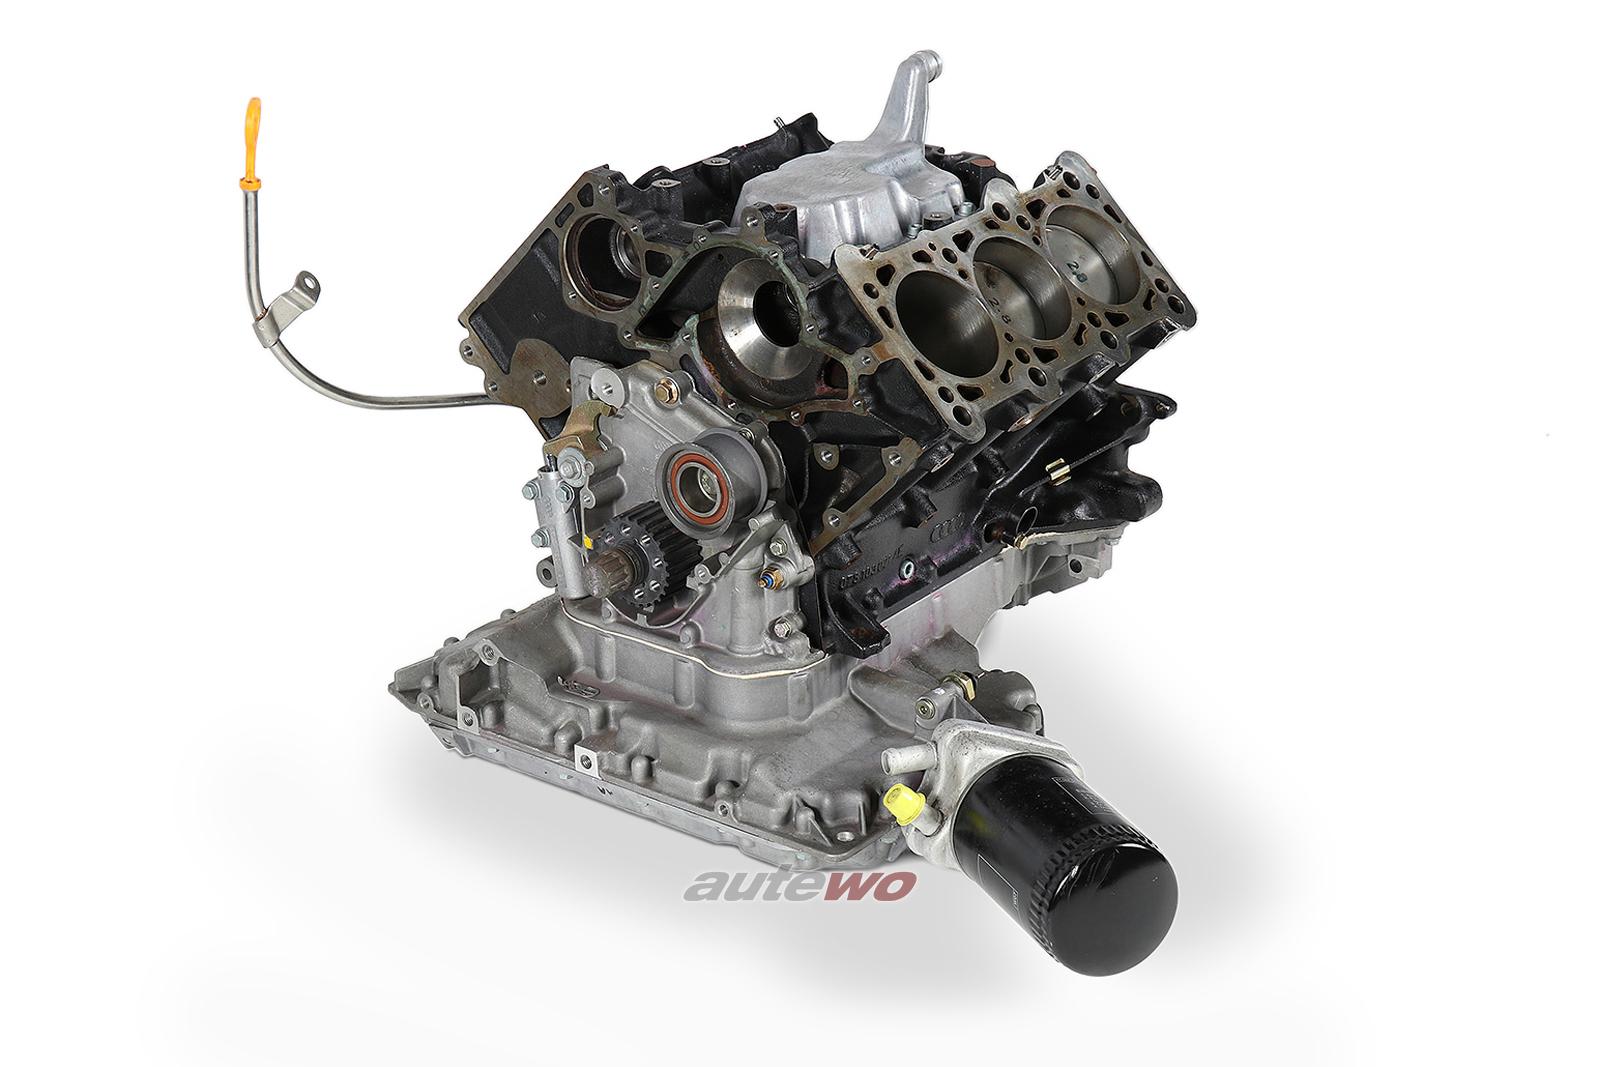 078103101BB NEU Skoda Superb  2.8l V6 ALG Motor auch ACK/ALG/AGE/APR/AQD/ATX